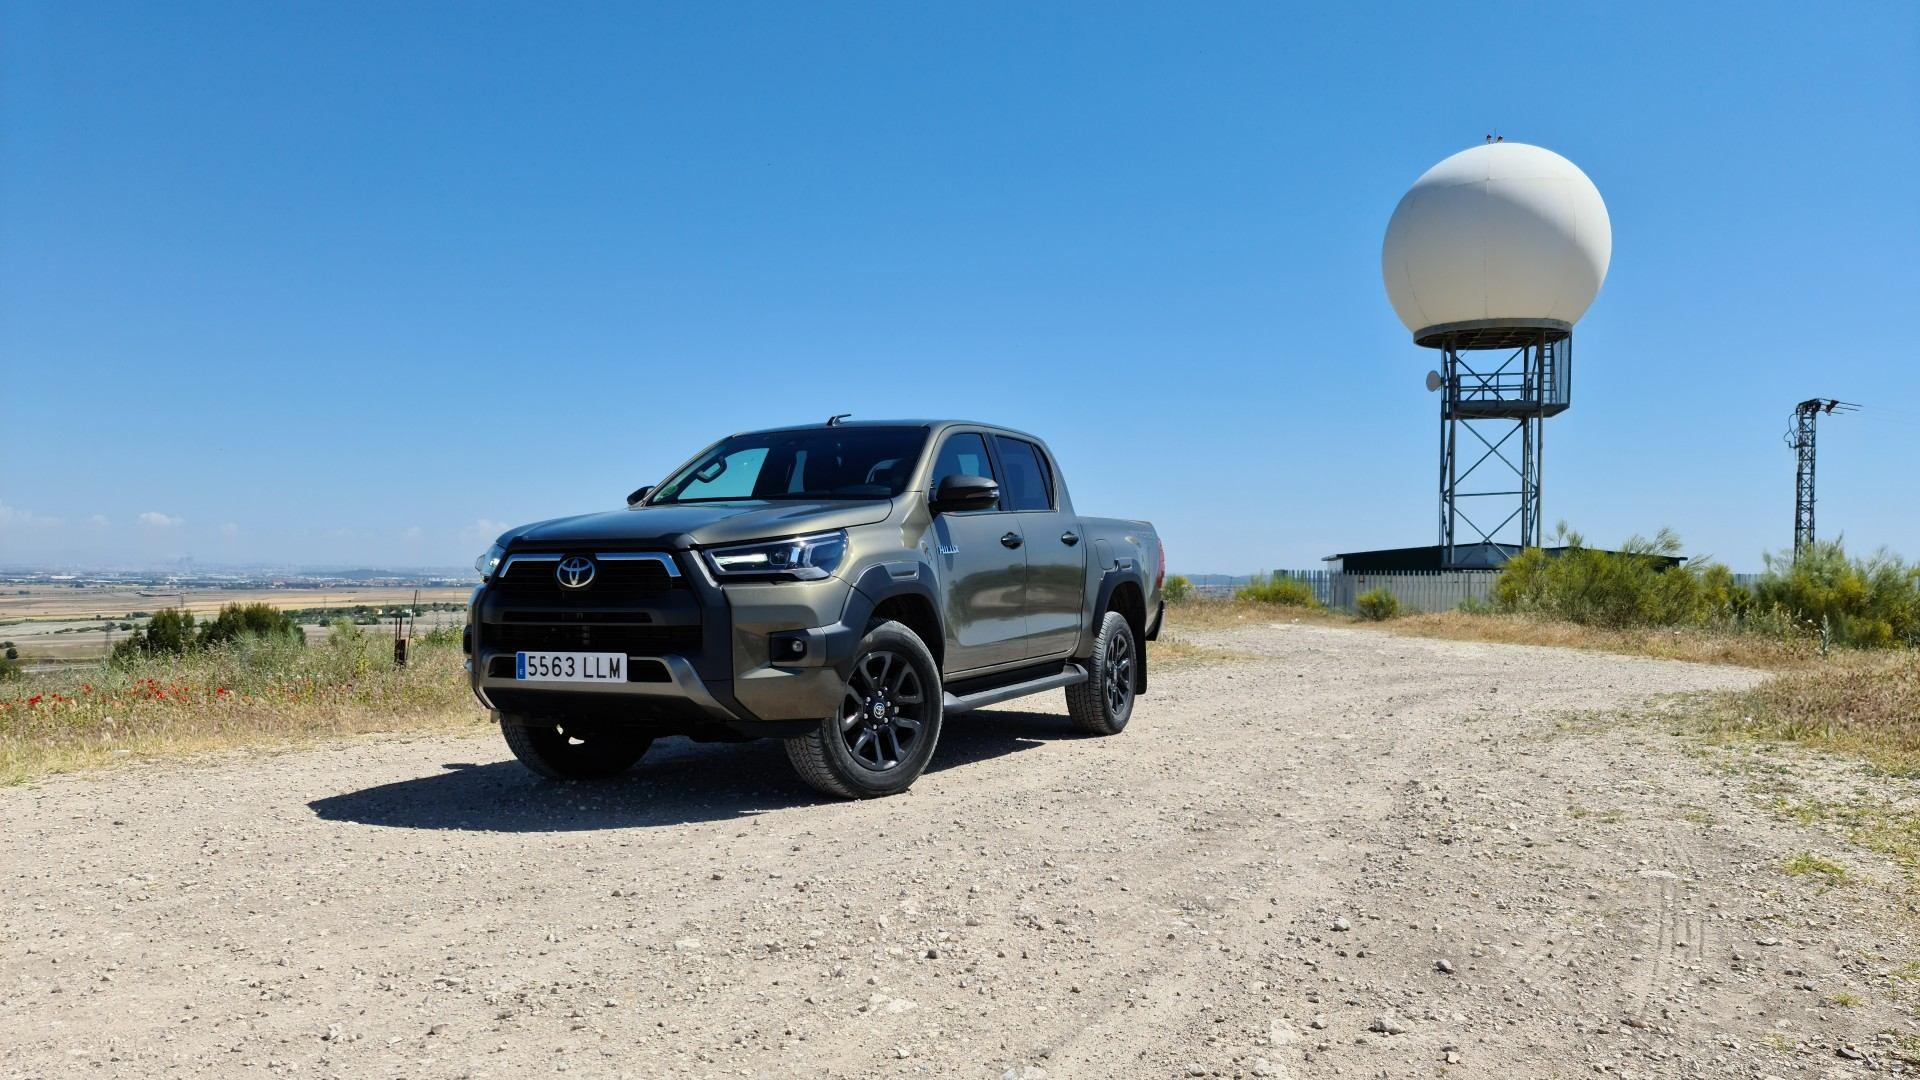 Prueba: Toyota Hilux Invincible 2.8D